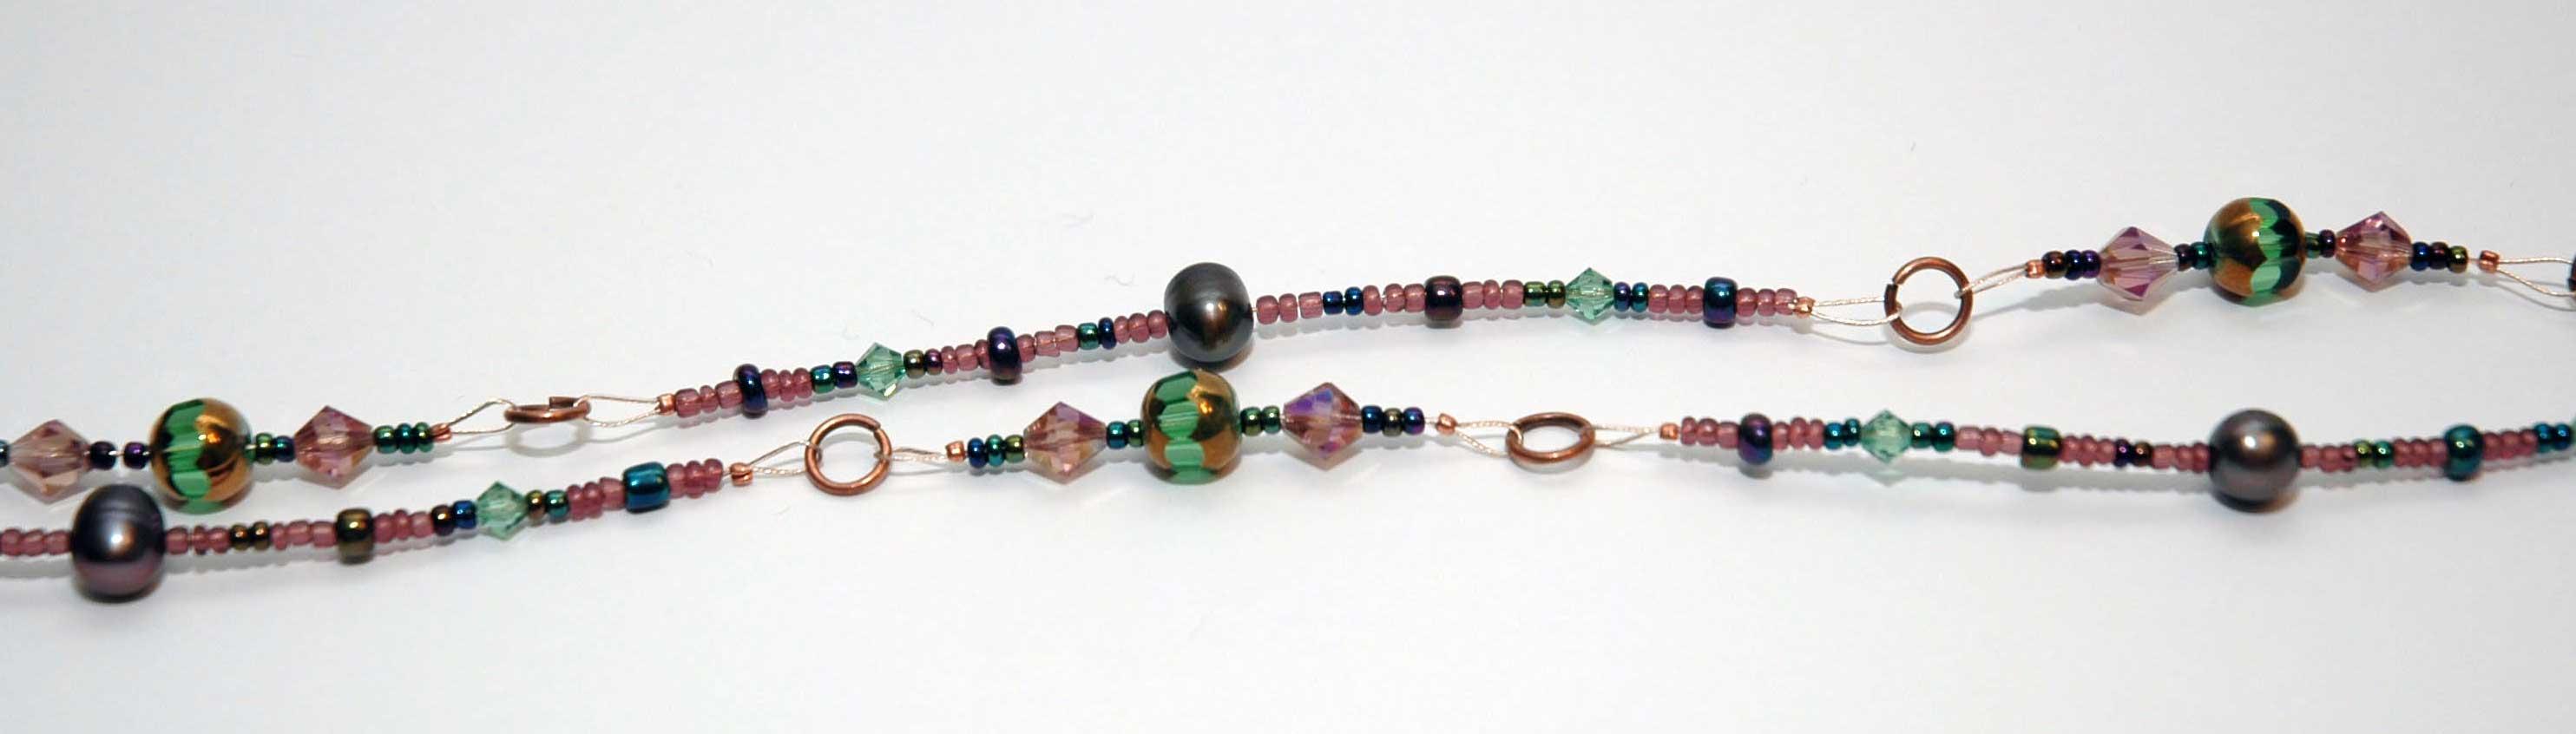 necklace100bweb